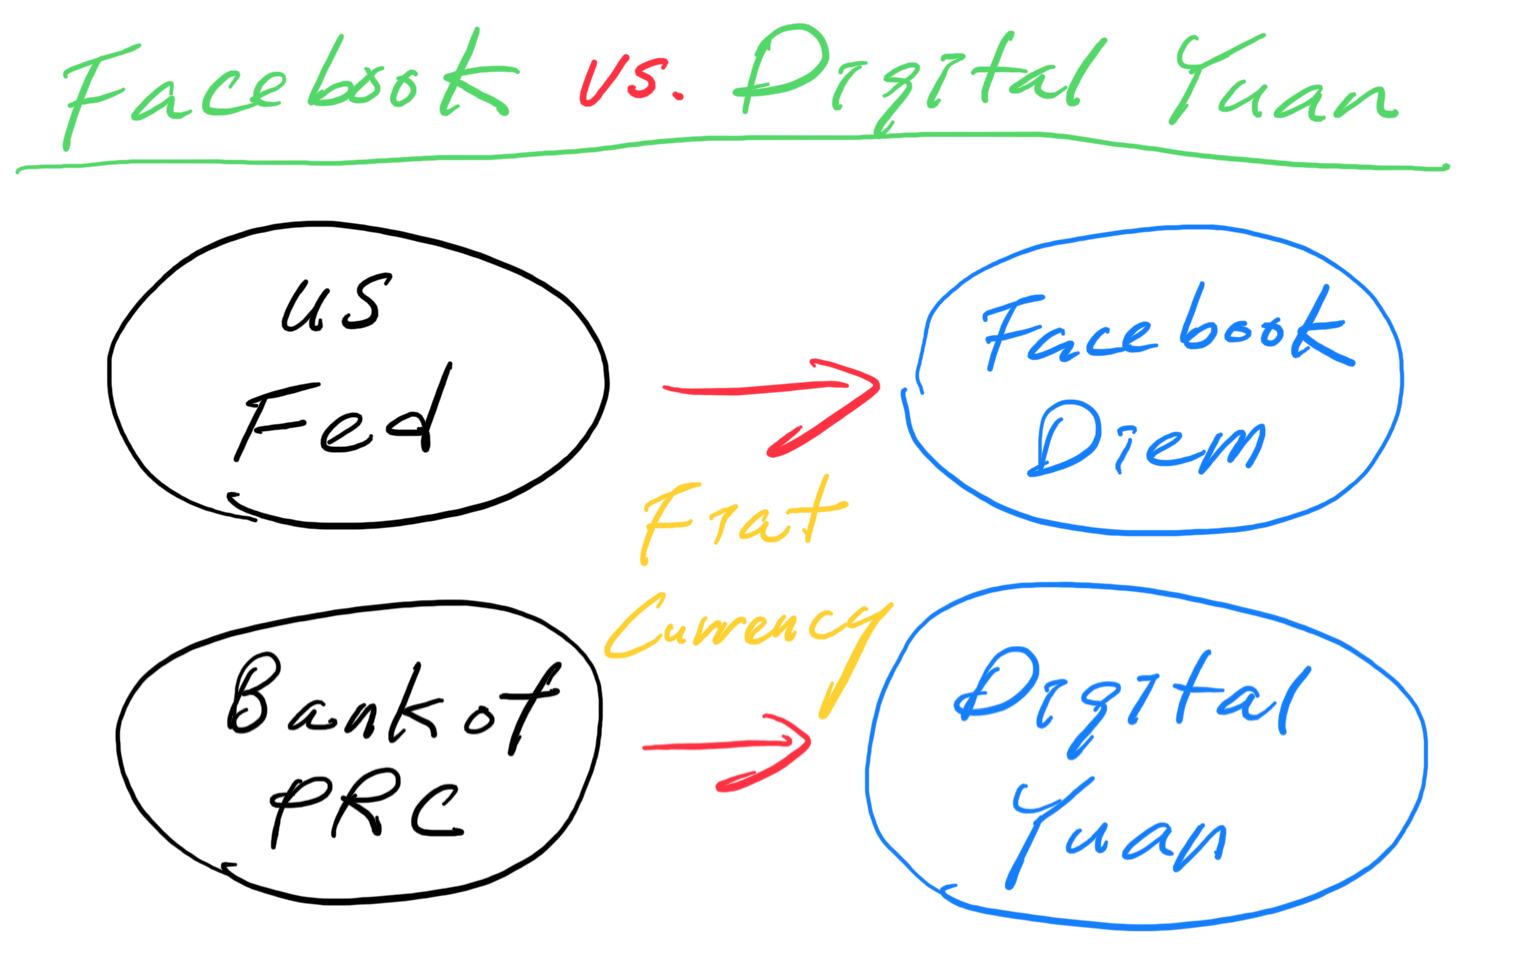 Facebook vs. Digital Yuan